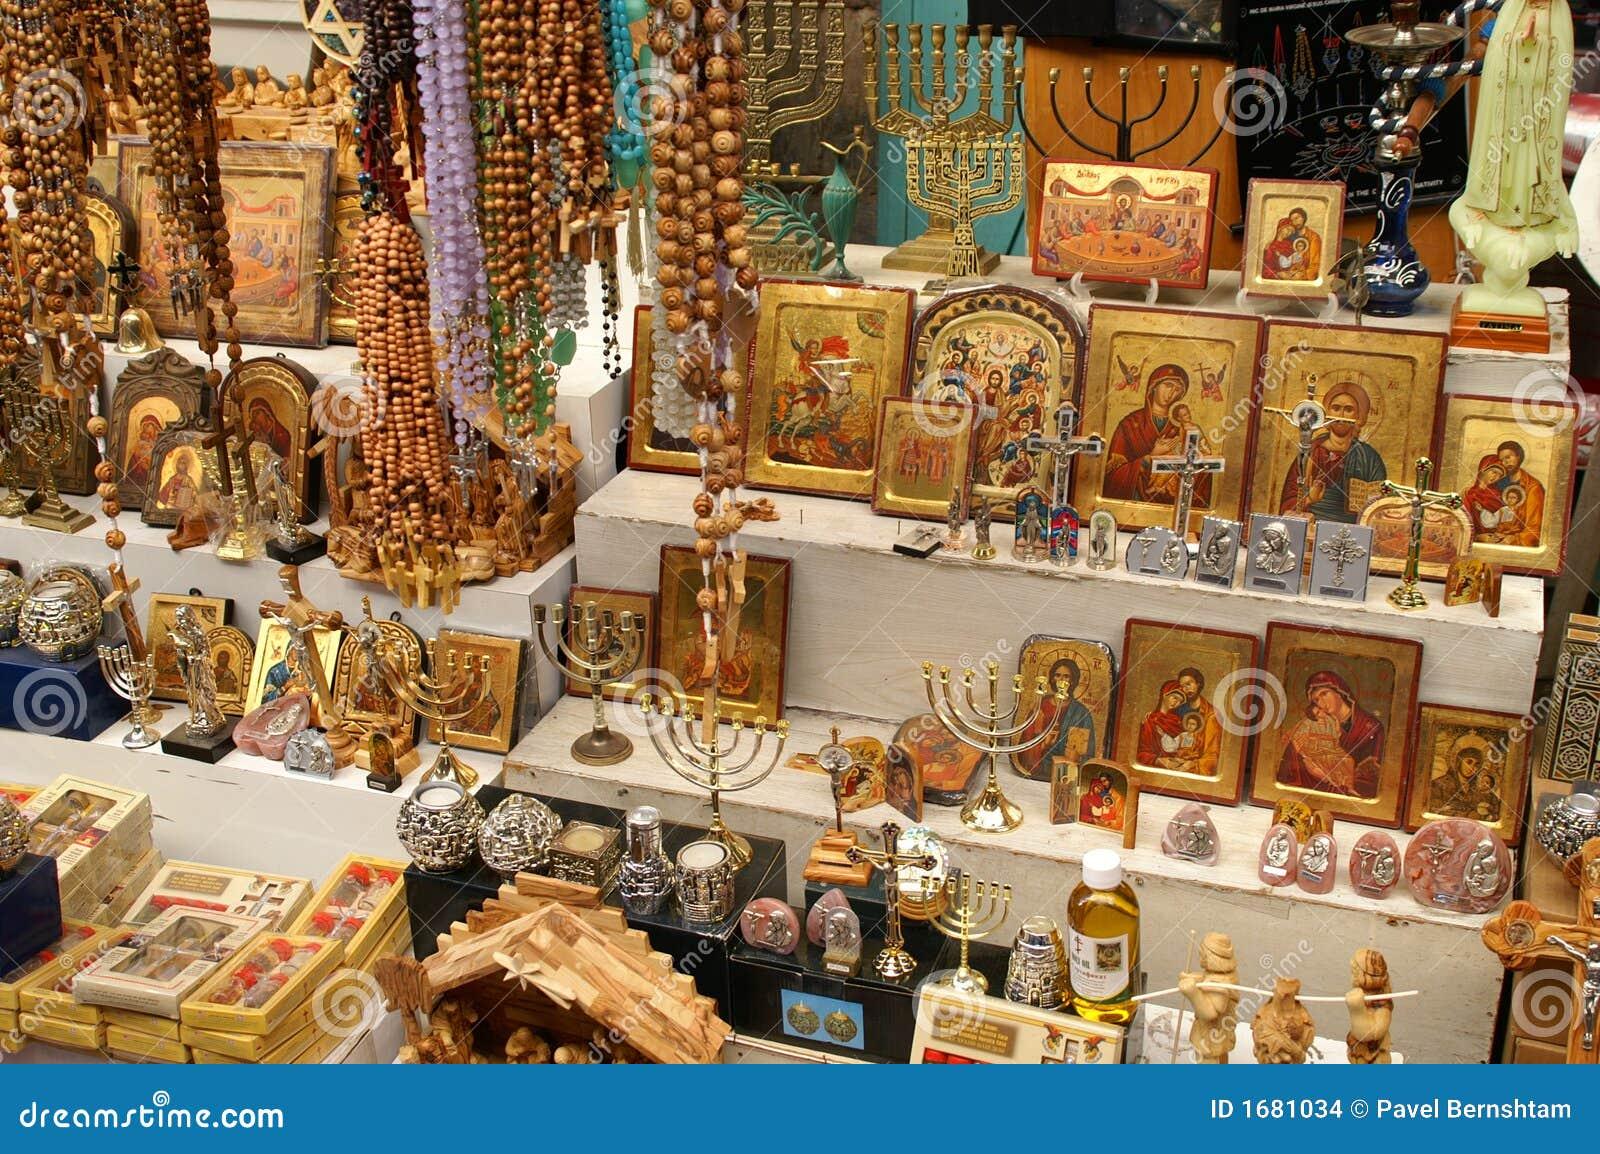 Christian Symbols In The Jerusalem East Market Stock Photo